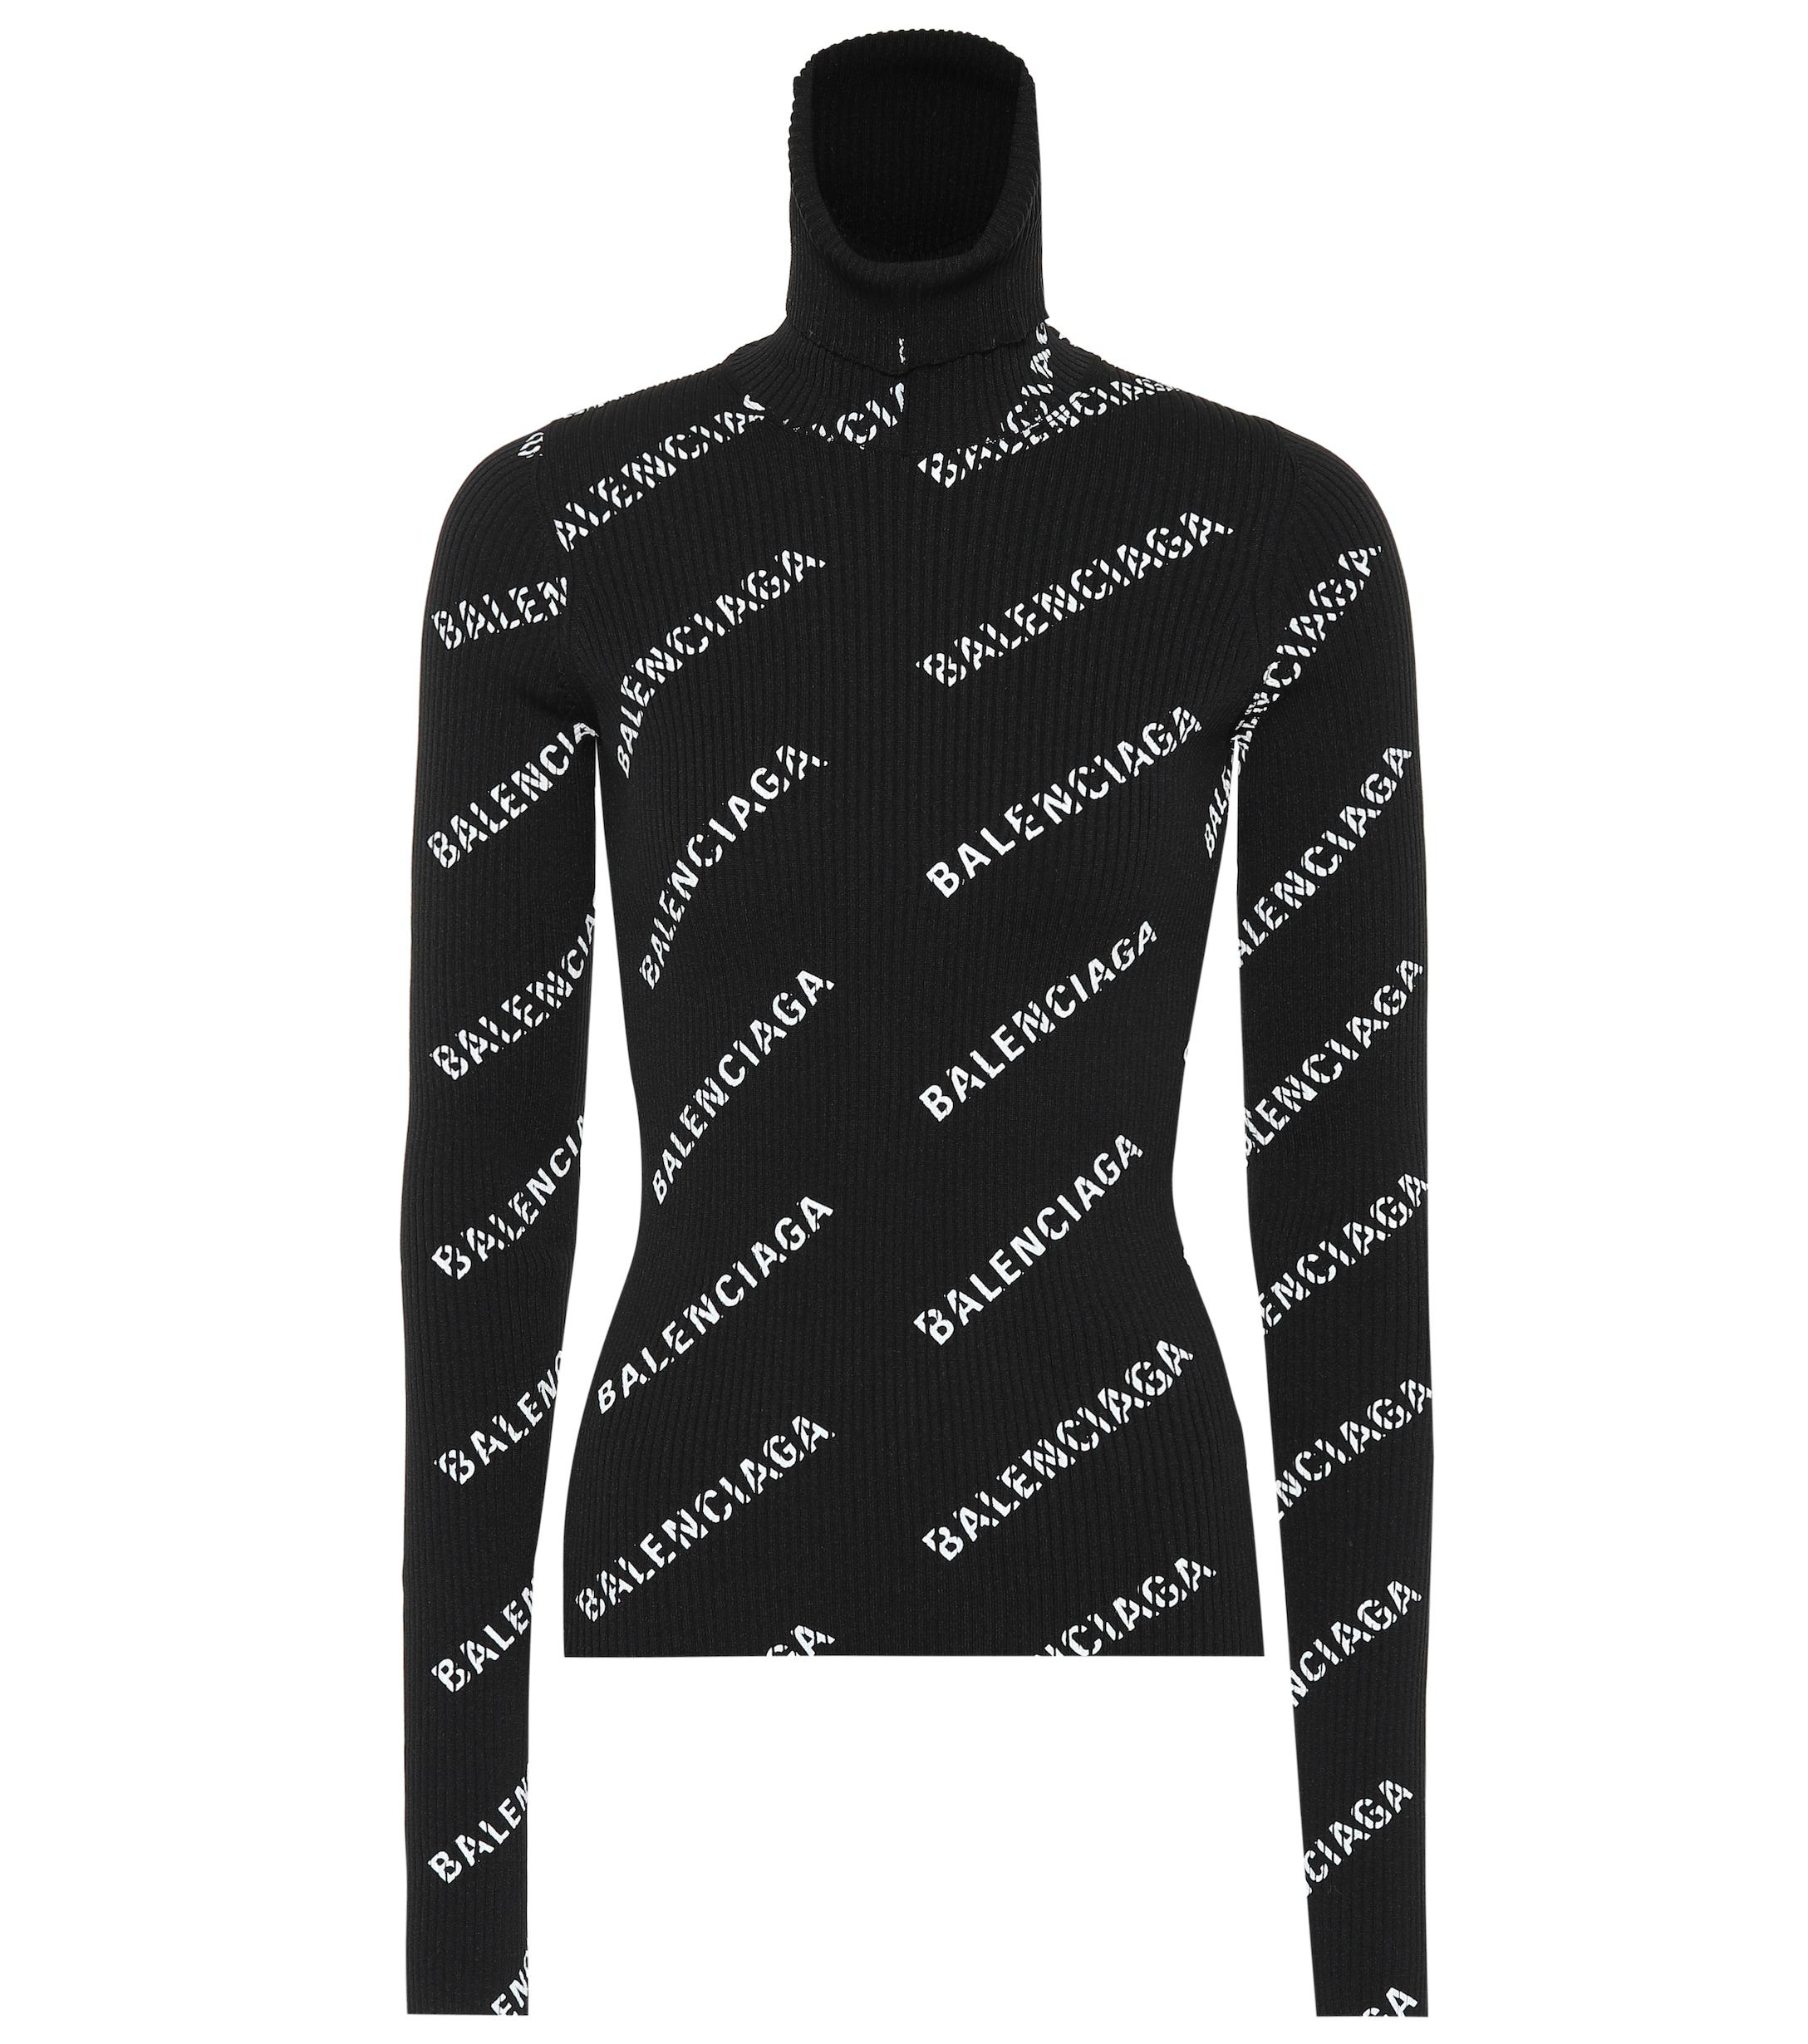 Balenciaga Logo-printed Sweater in Black - Lyst 84010e086